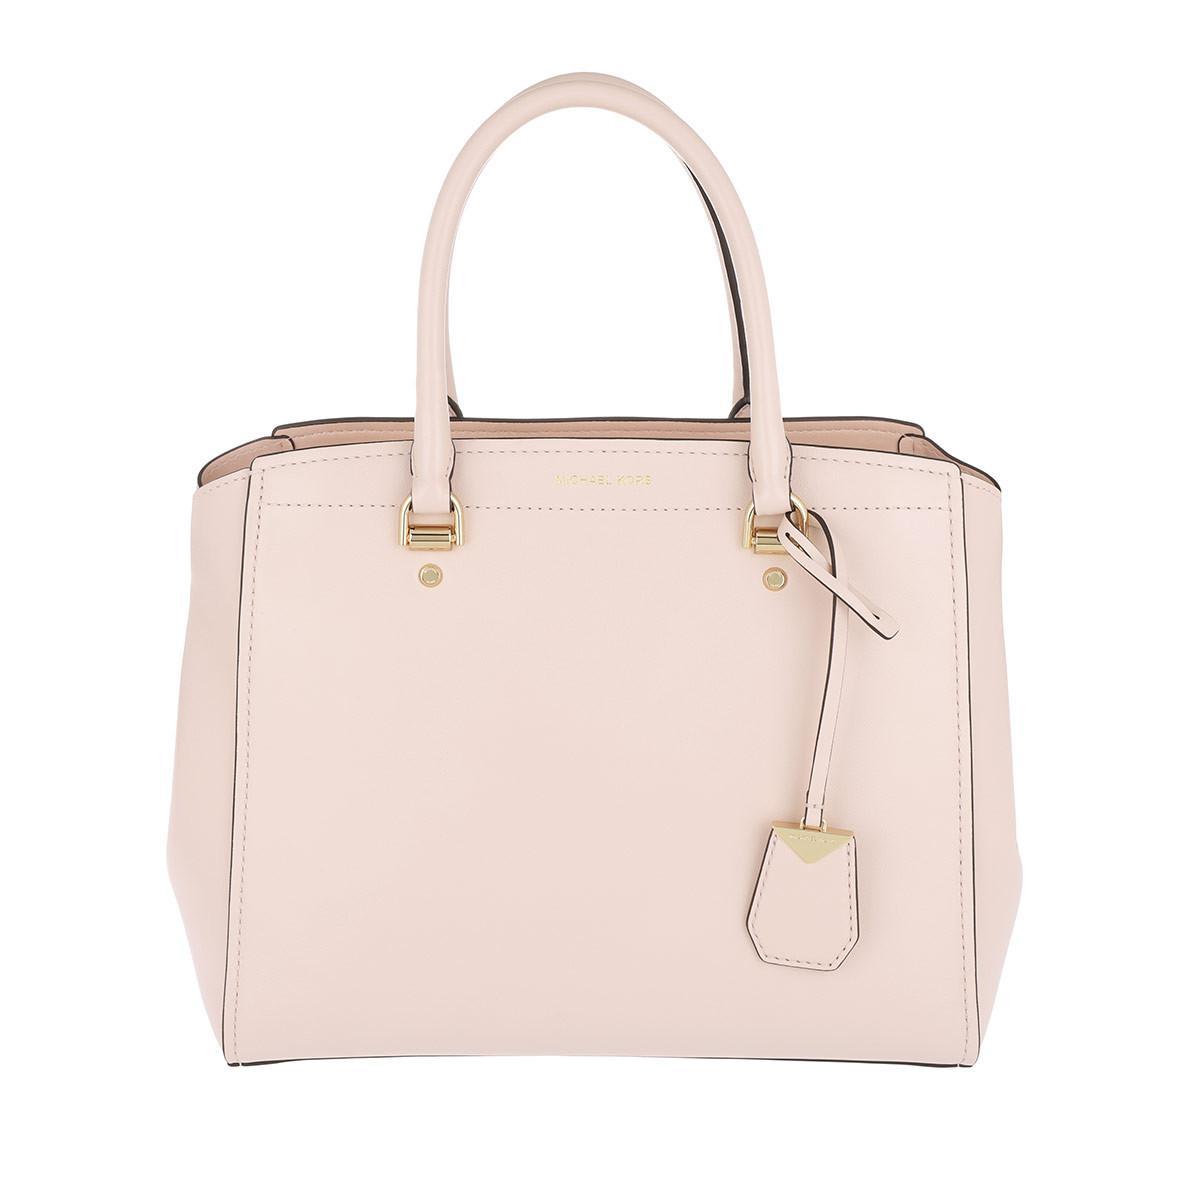 2e2b9dbb5a8b2 Michael Kors Benning Lg Satchel Bag Soft Pink in Pink - Lyst